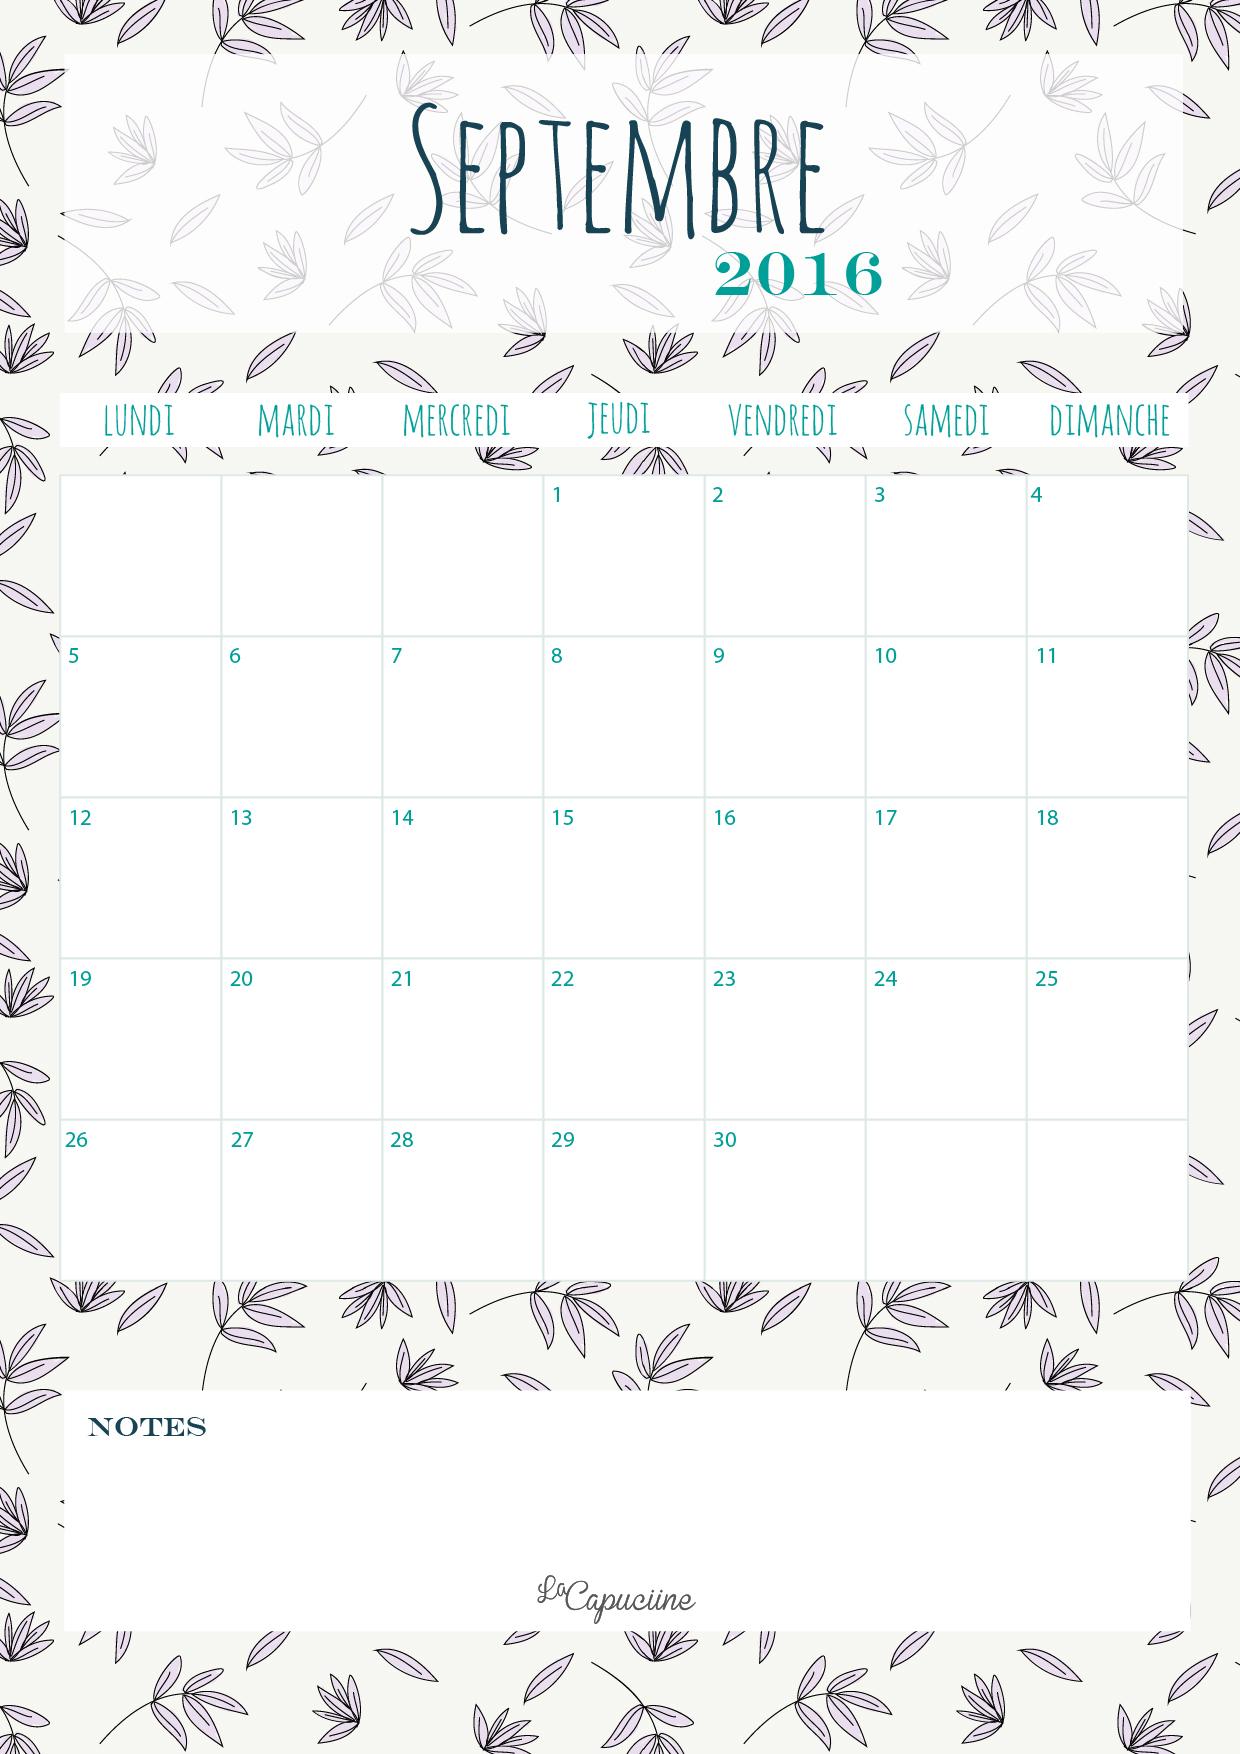 calendrier-septembre-2016-lacapuciine